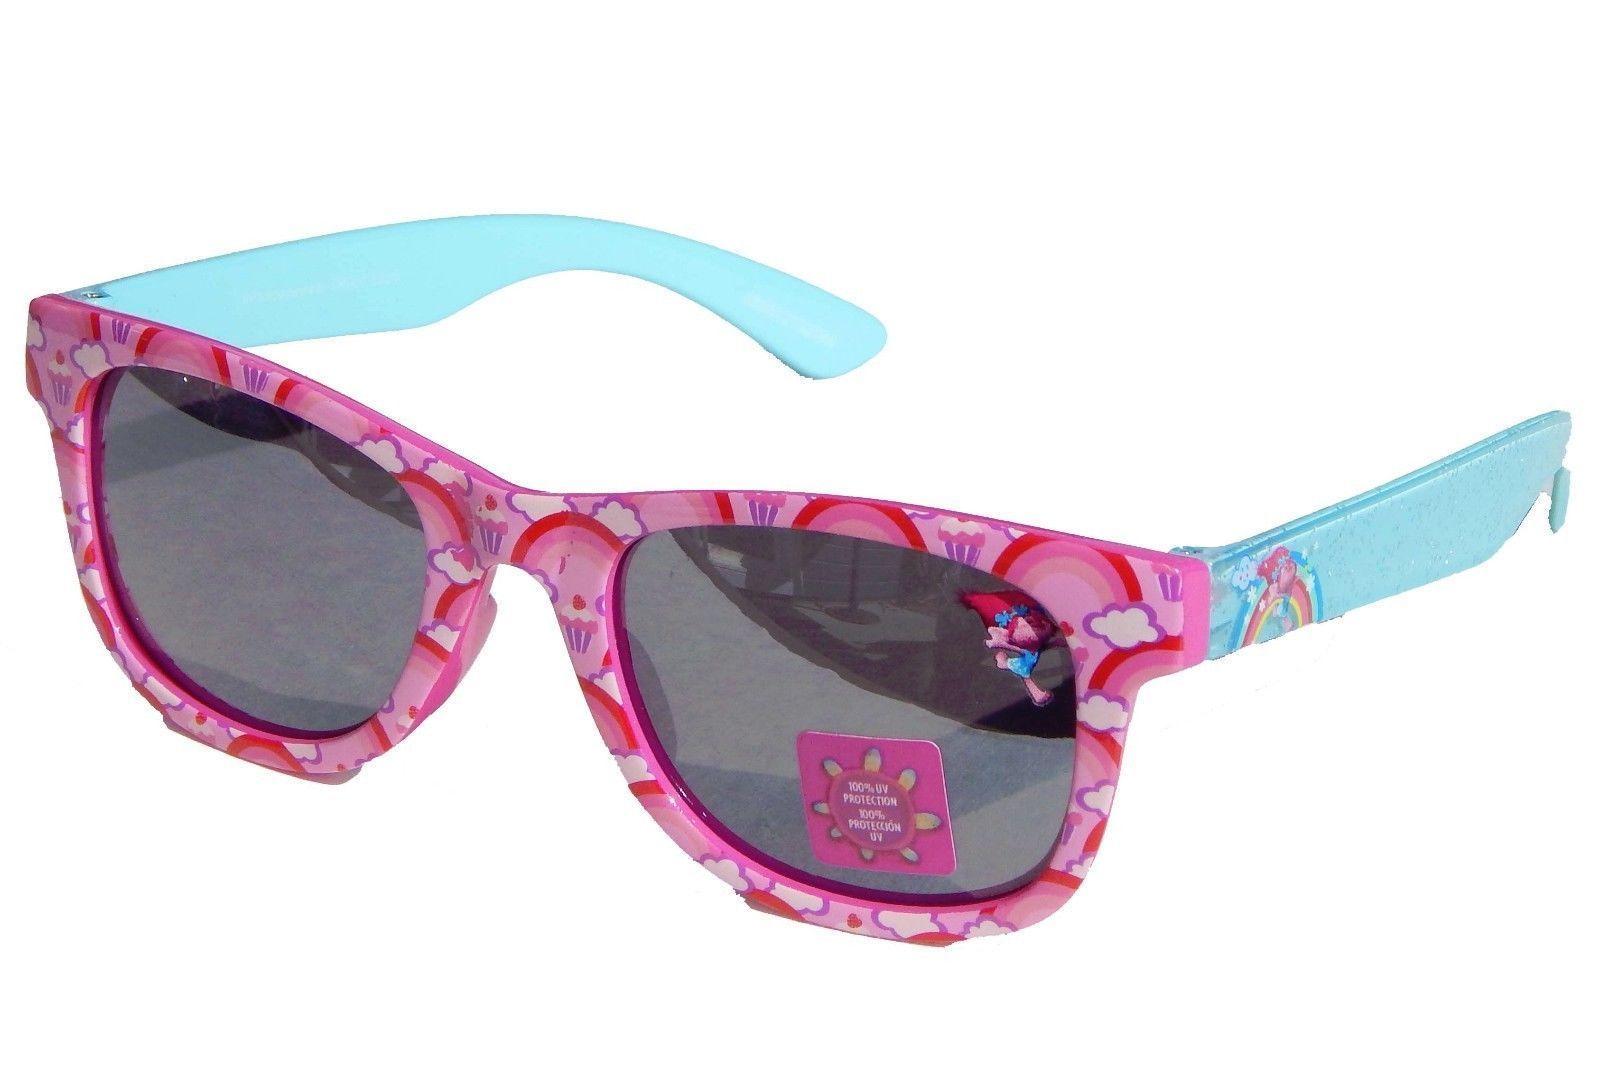 TROLLS PRINCESS POPPY Girls Pink Sparkle 100%UV Shatter Resistant Sunglasses NWT